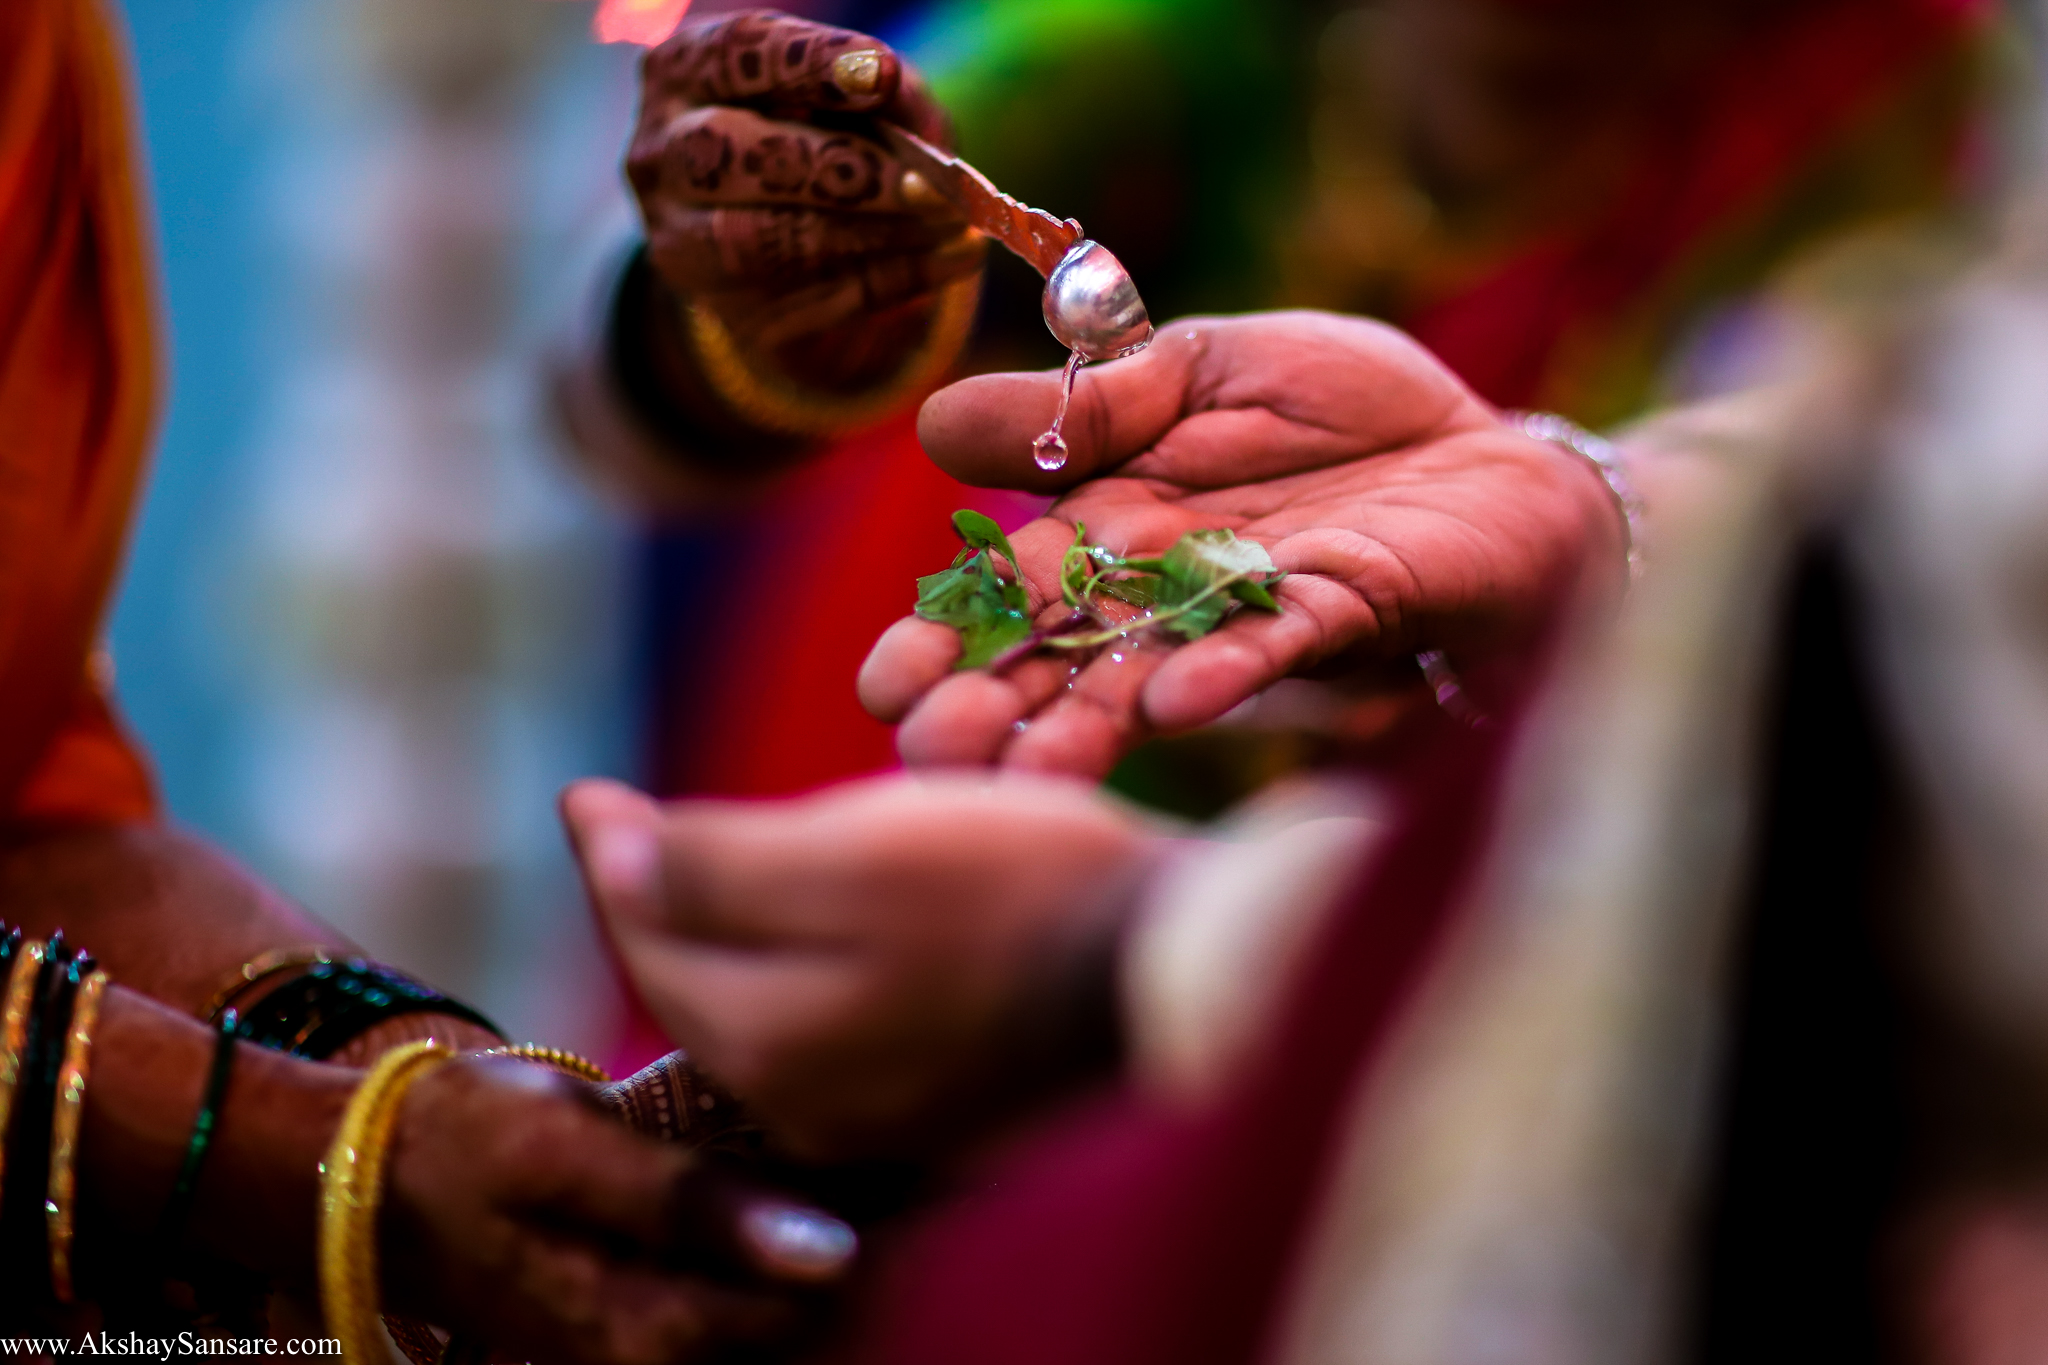 Nupur & Rohan wedding Akshay Sansare Photography best wedding photographer in mumbai India Candid(41).jpg